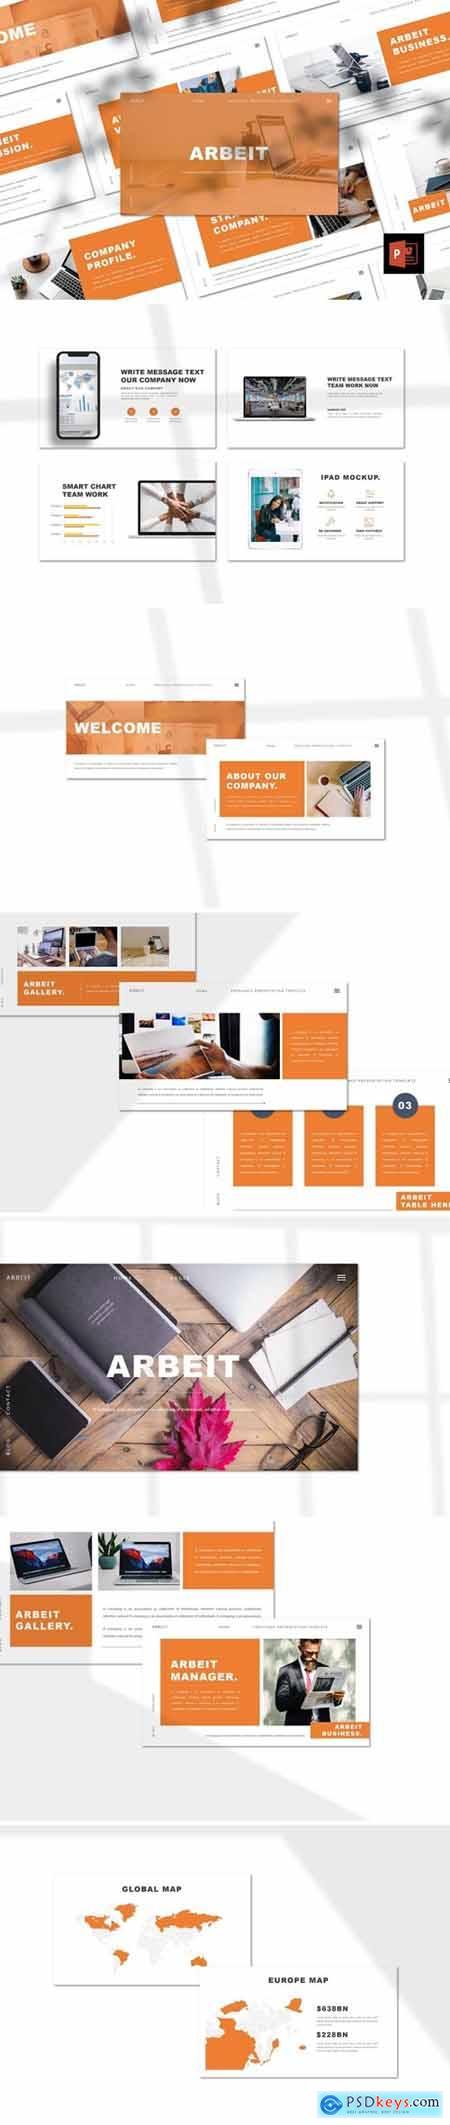 Arbeit - Portfolio Powerpoint, Keynote and Google Slides Templates